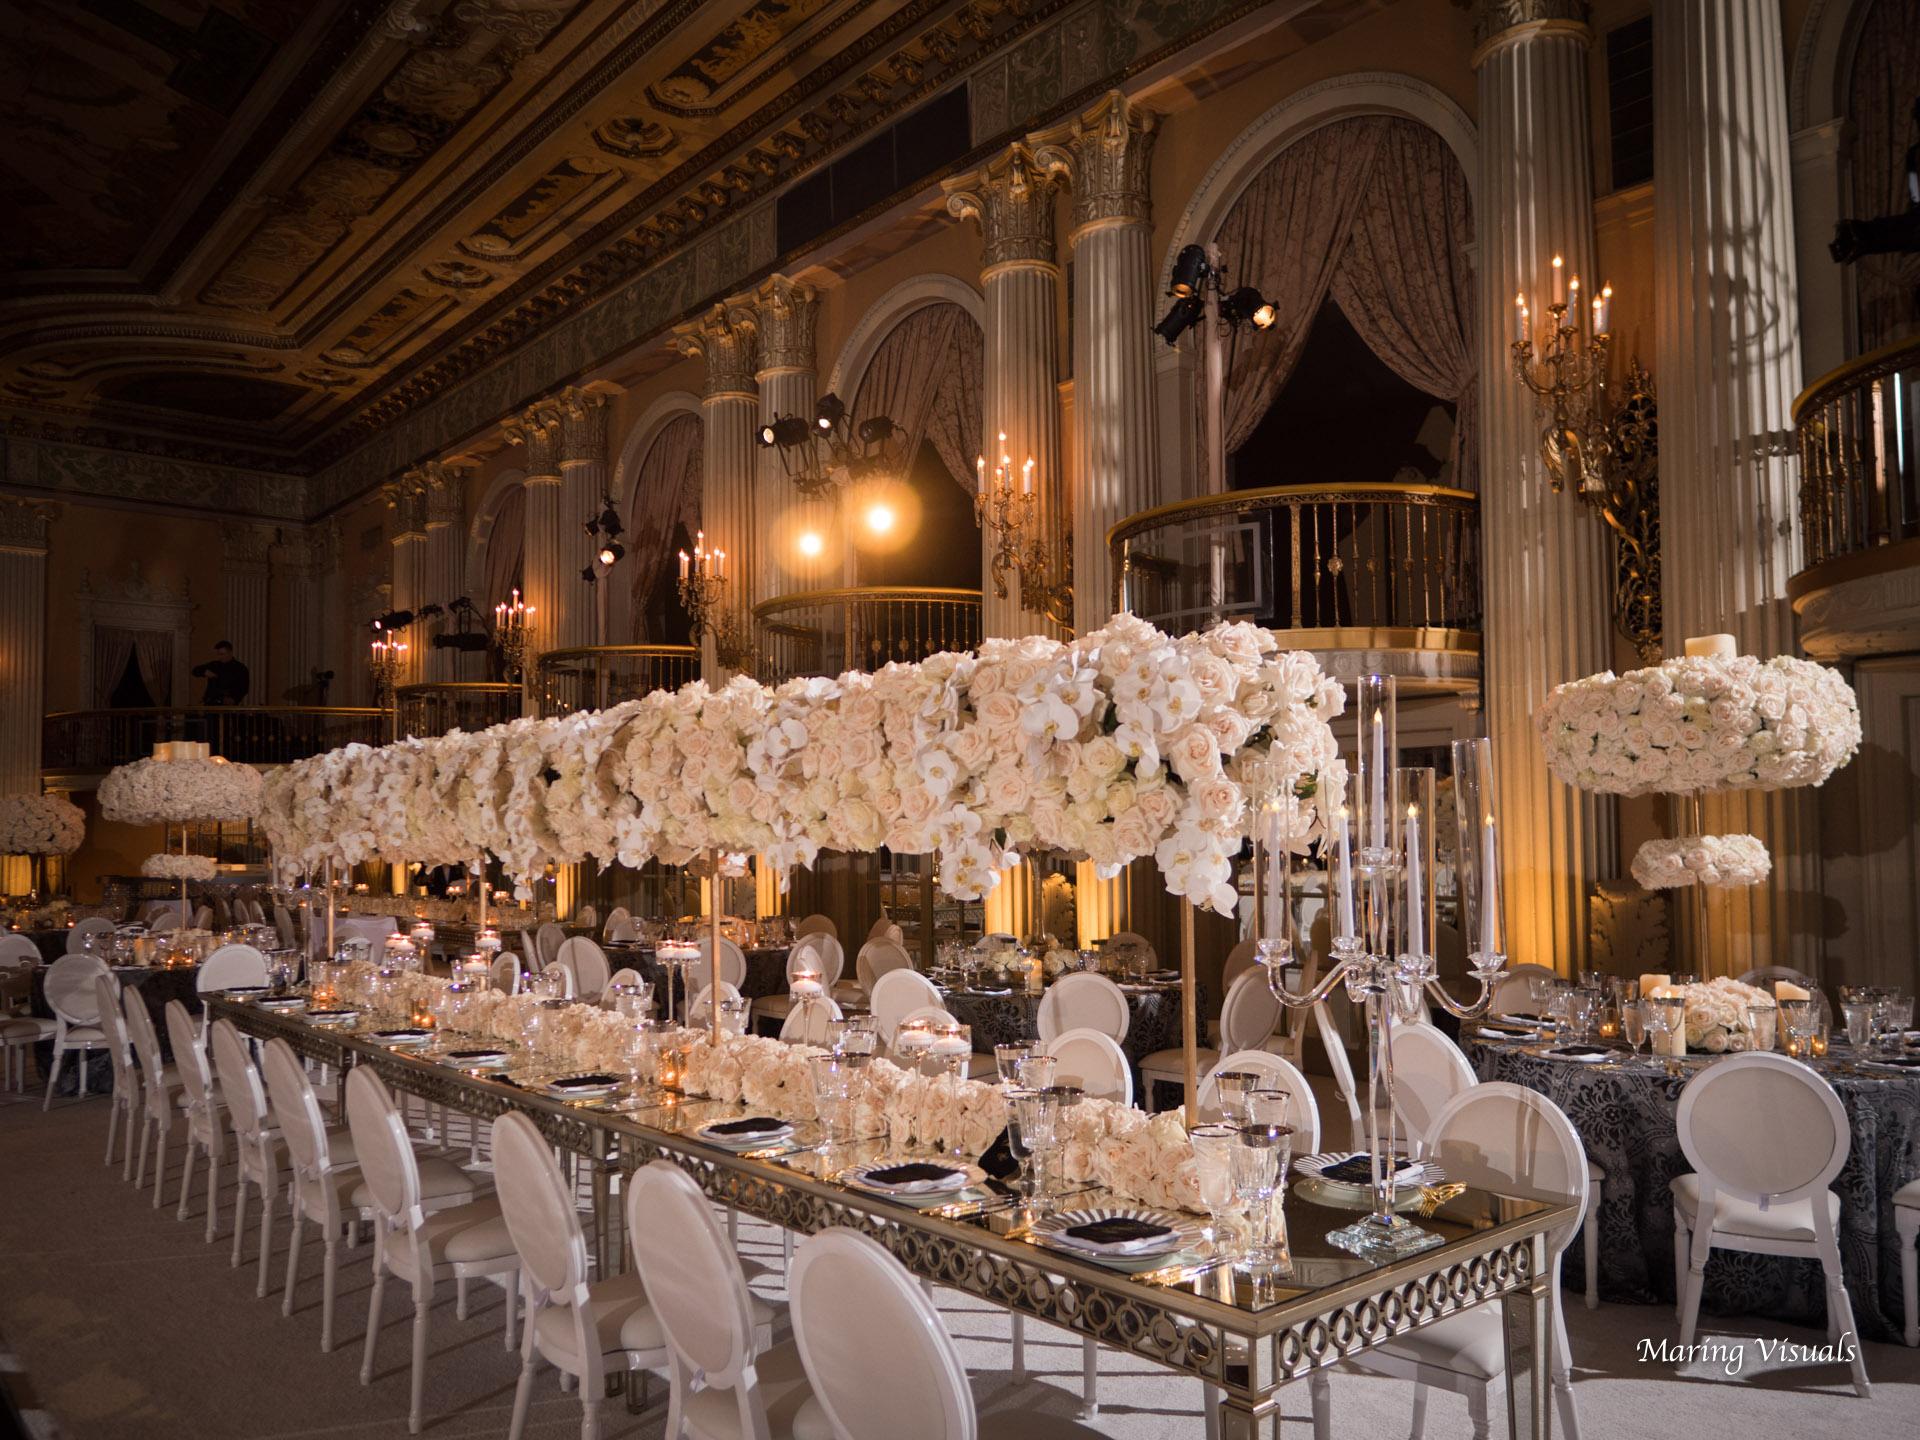 David Tutera Weddings by Maring Visuals 00545.jpg